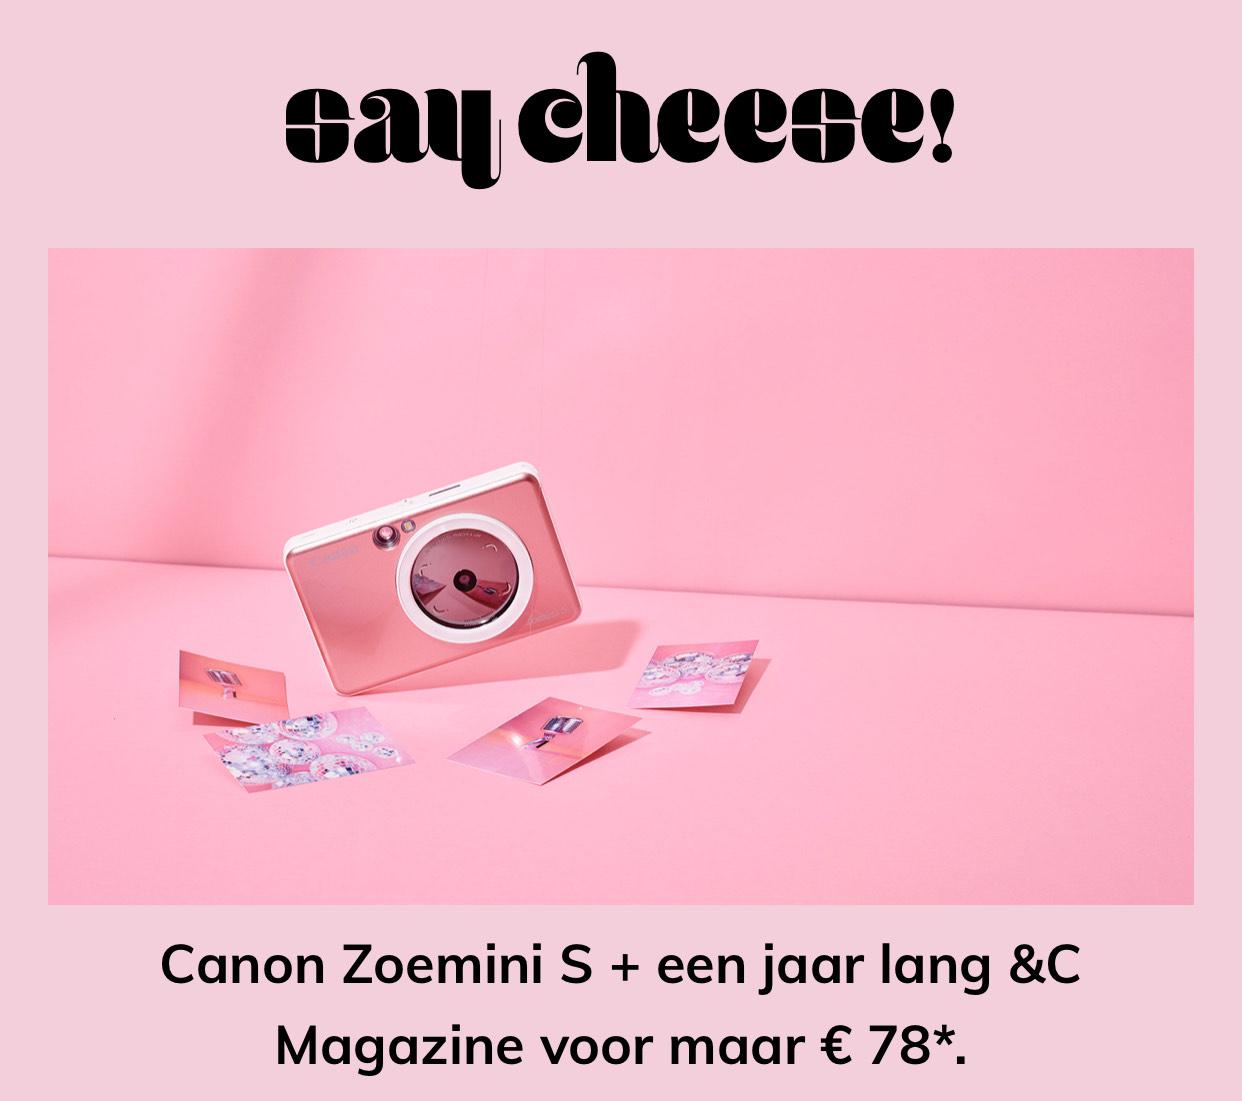 Canon Zoemini S + &C (Chantal Janzen) abonnement